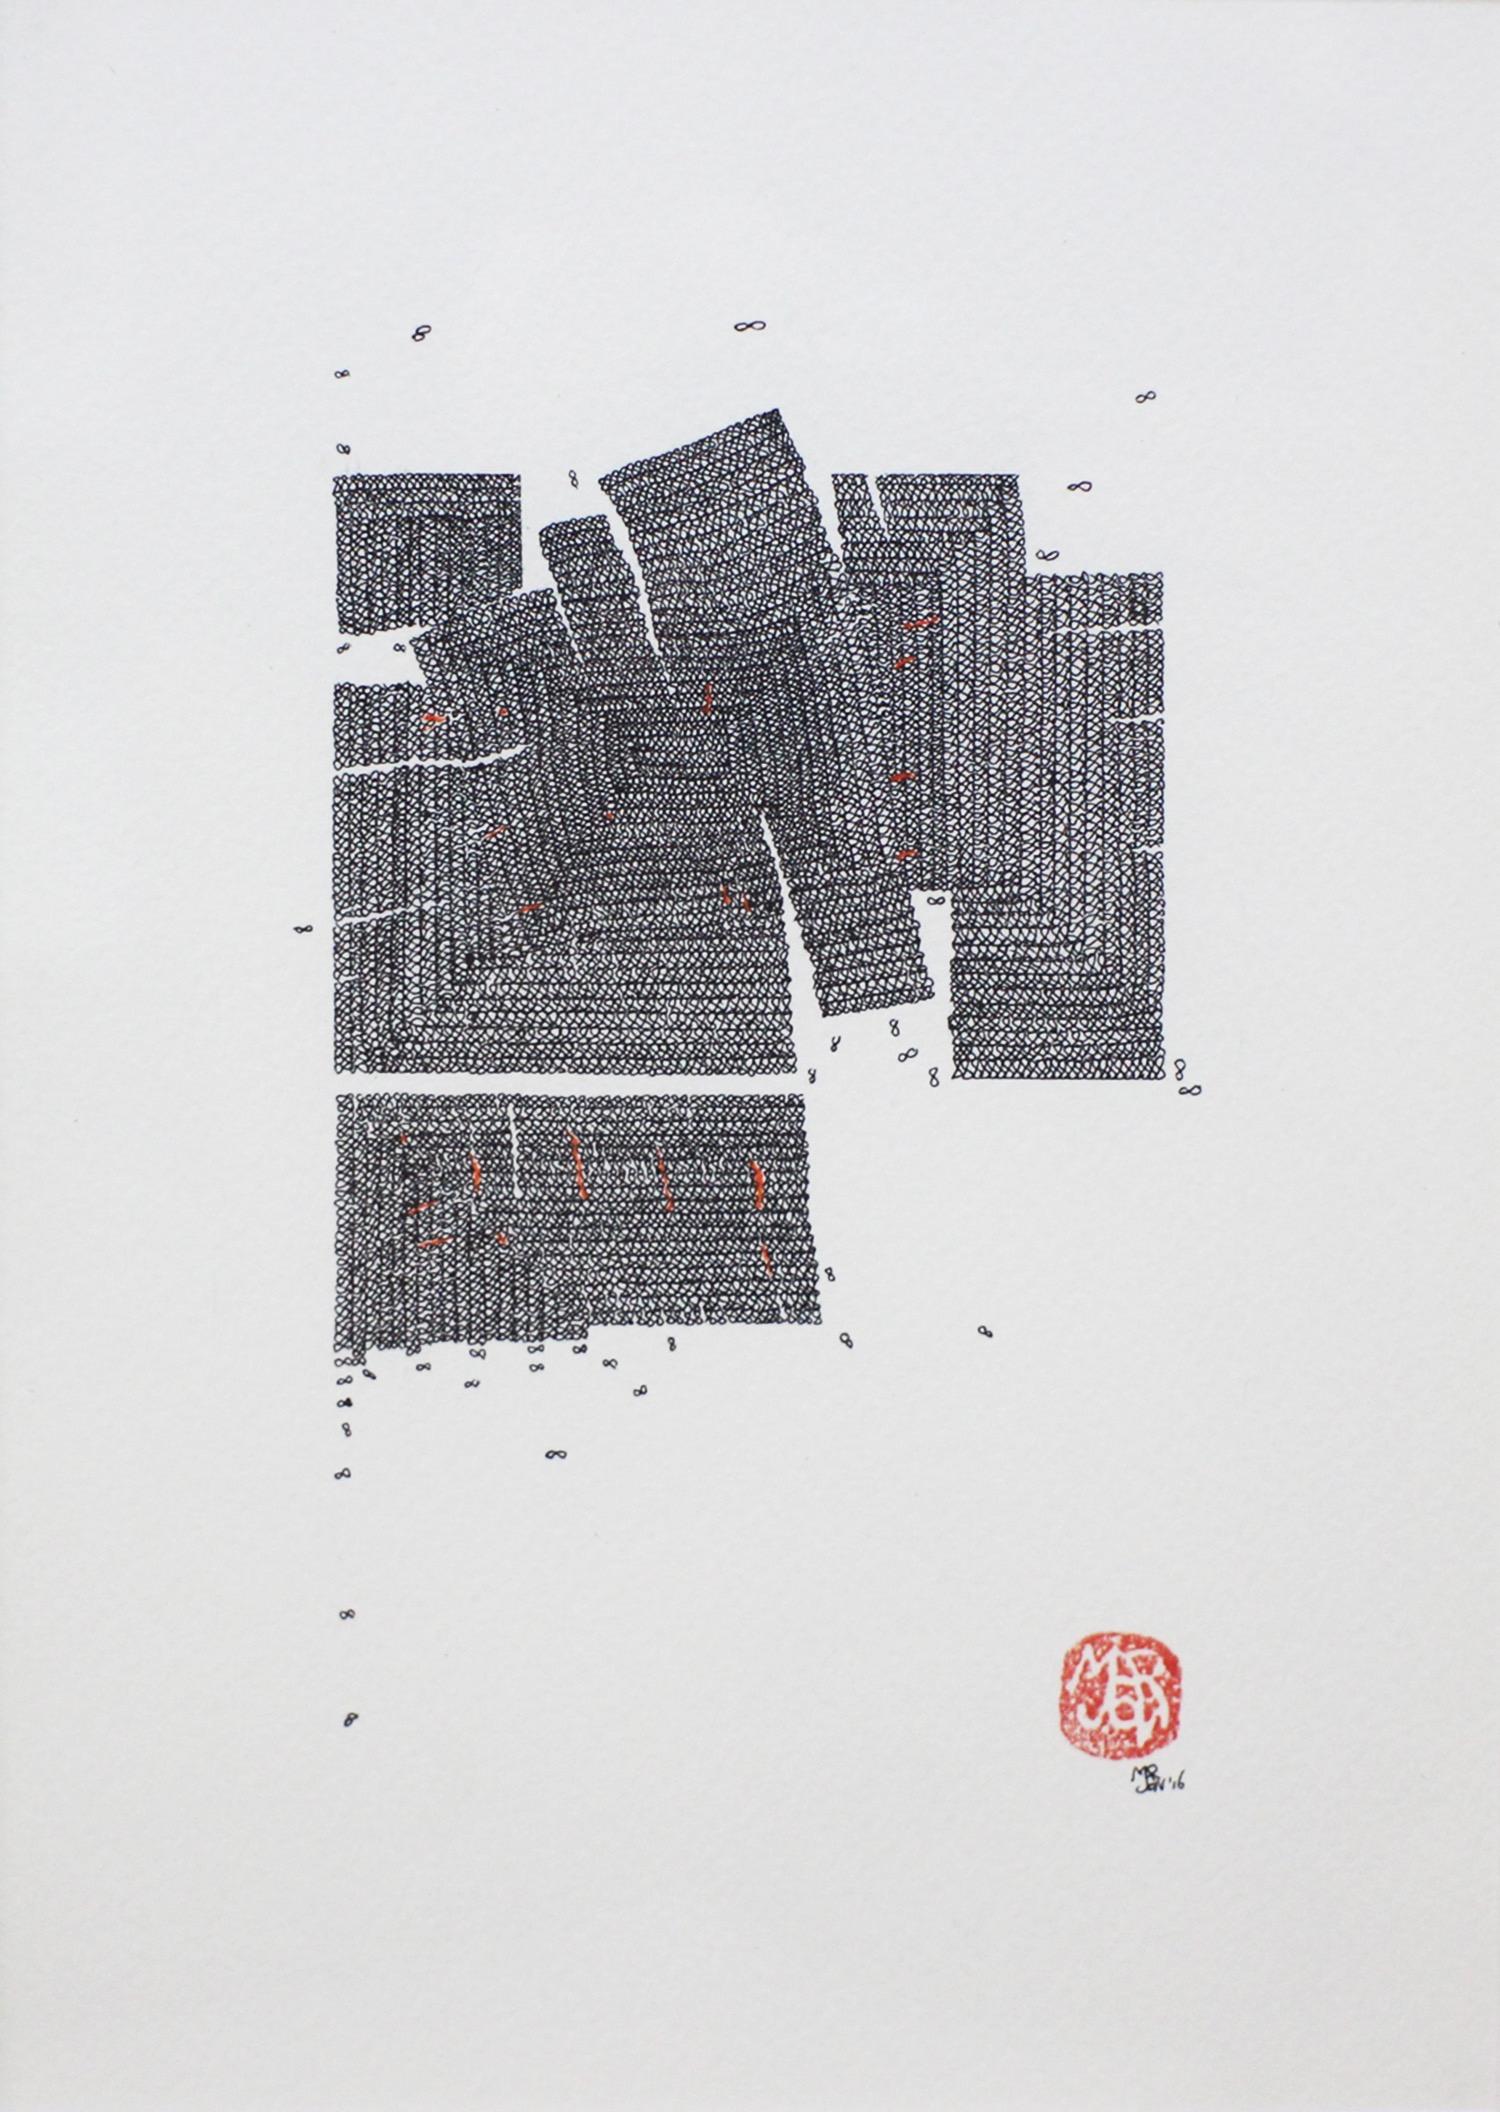 Marjon Barton, Untitled #35(2016), 15x21.5cm, Ink on Paper